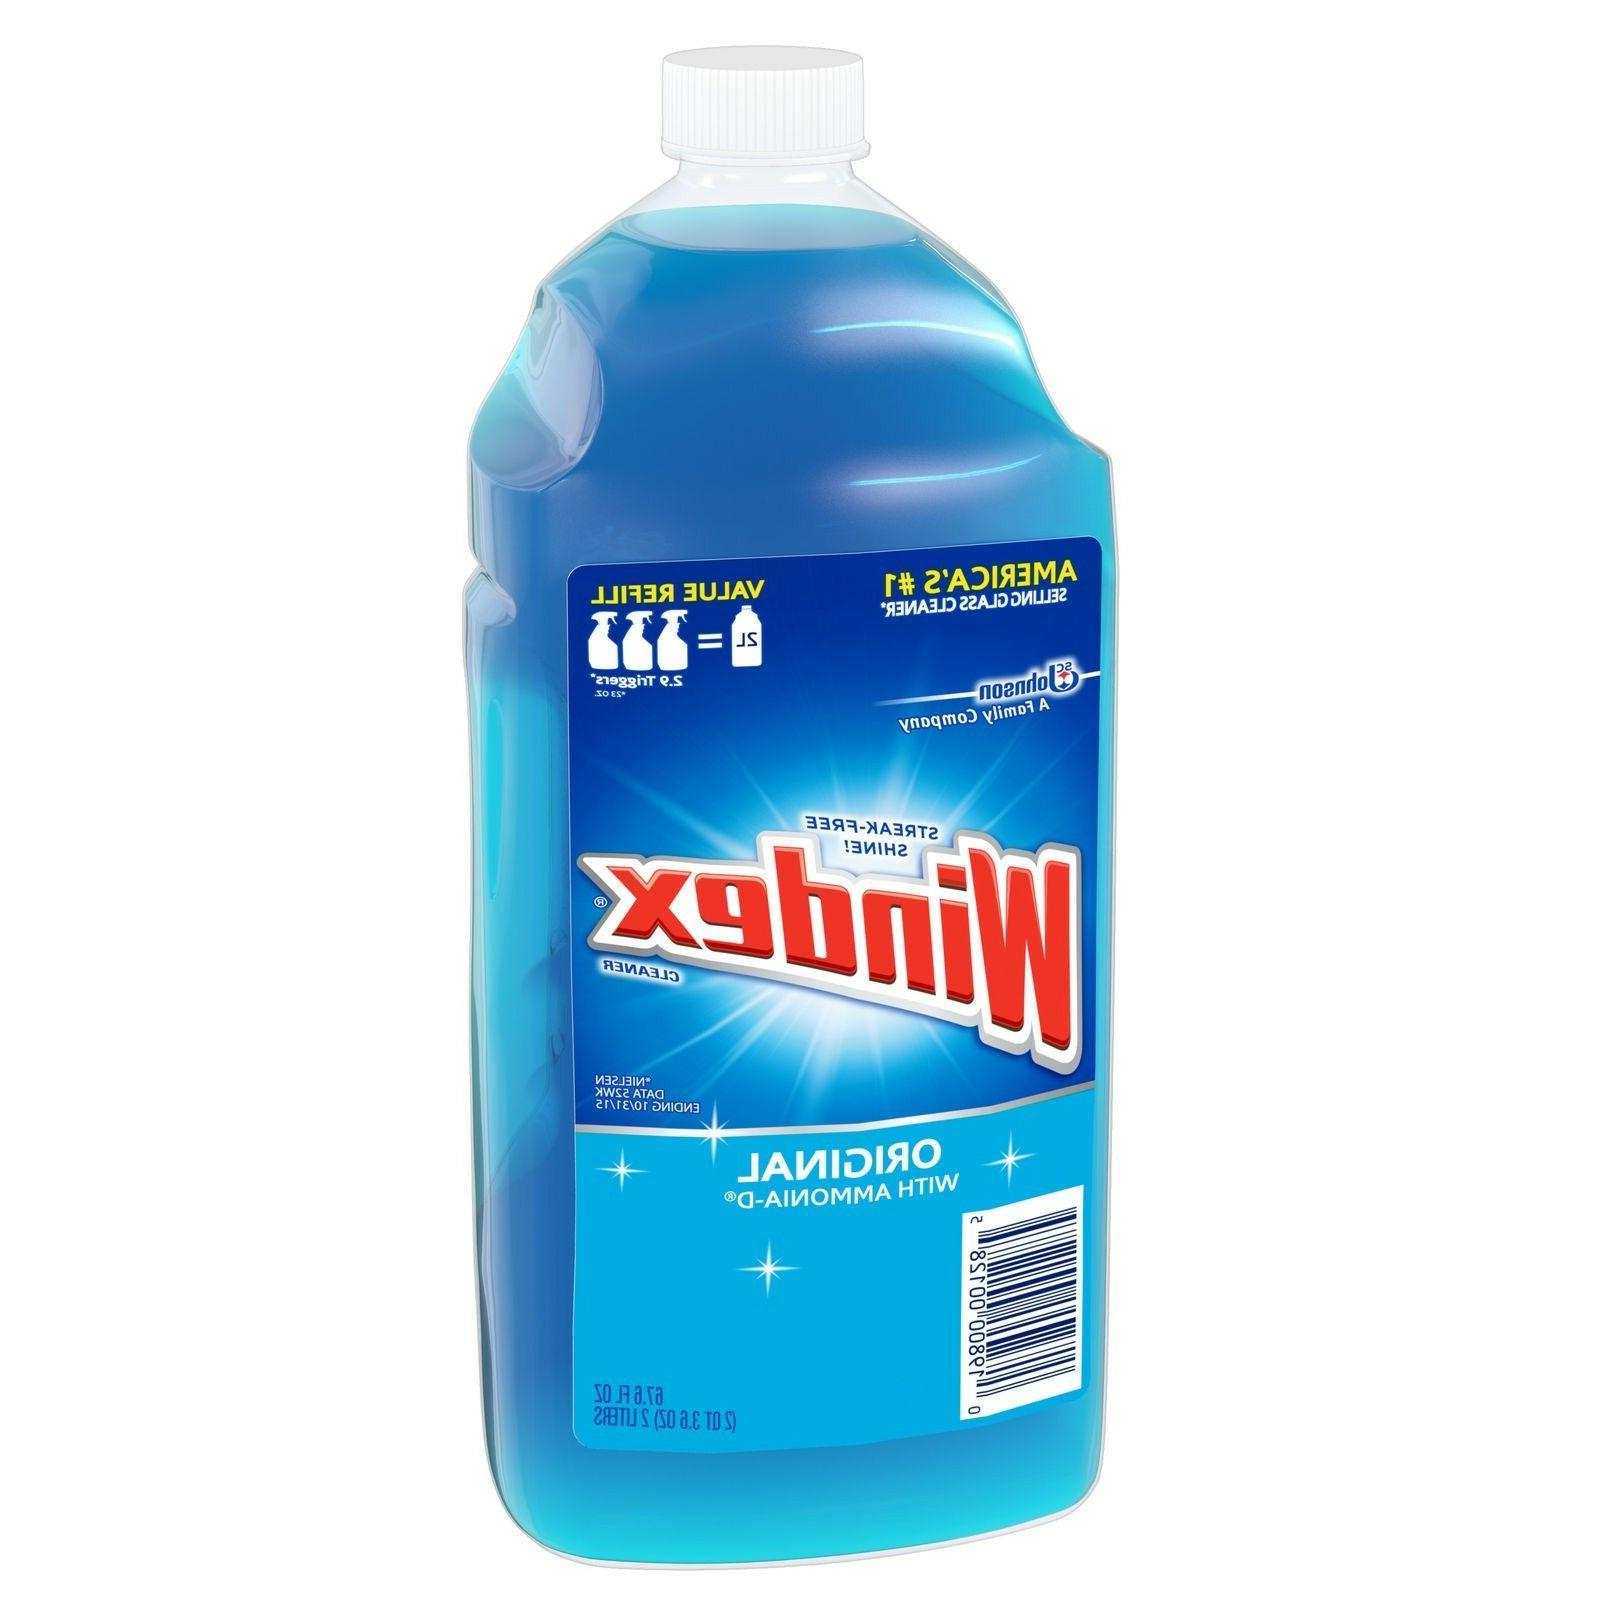 Windex Glass Cleaner with Ammonia-D, Original, oz